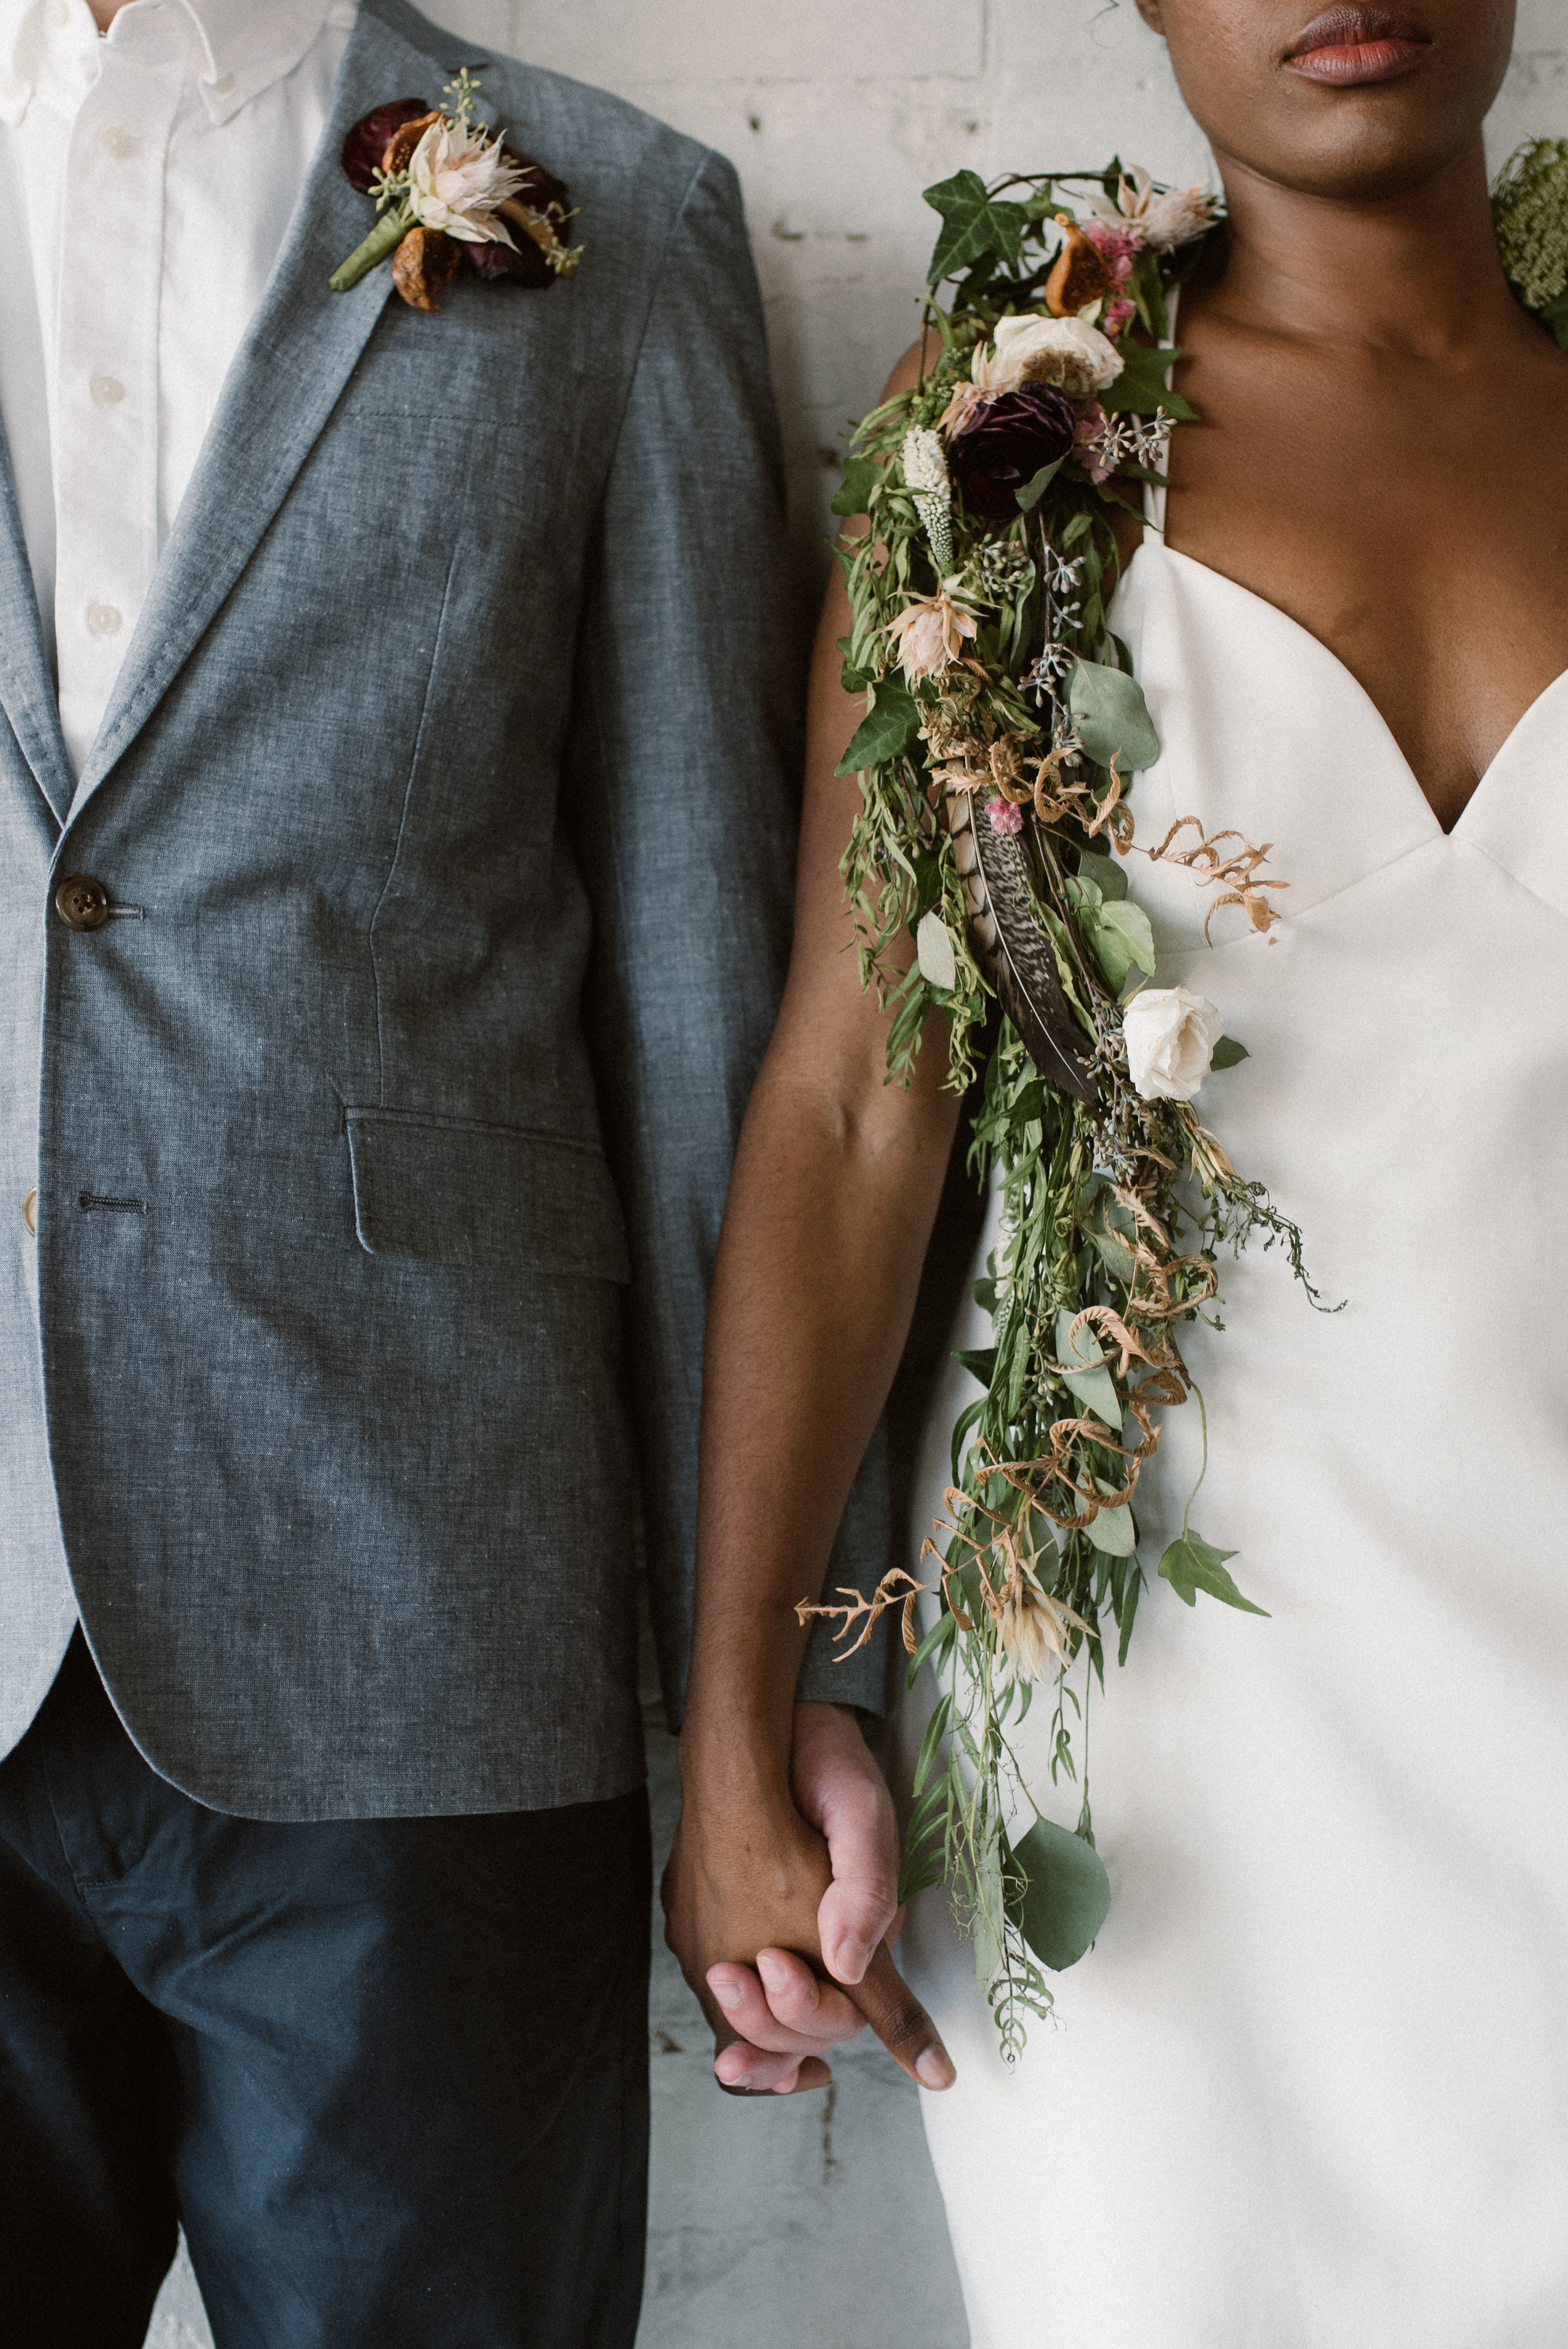 haus-820-minimal-editorial-wedding-styled-shoot-62.jpg